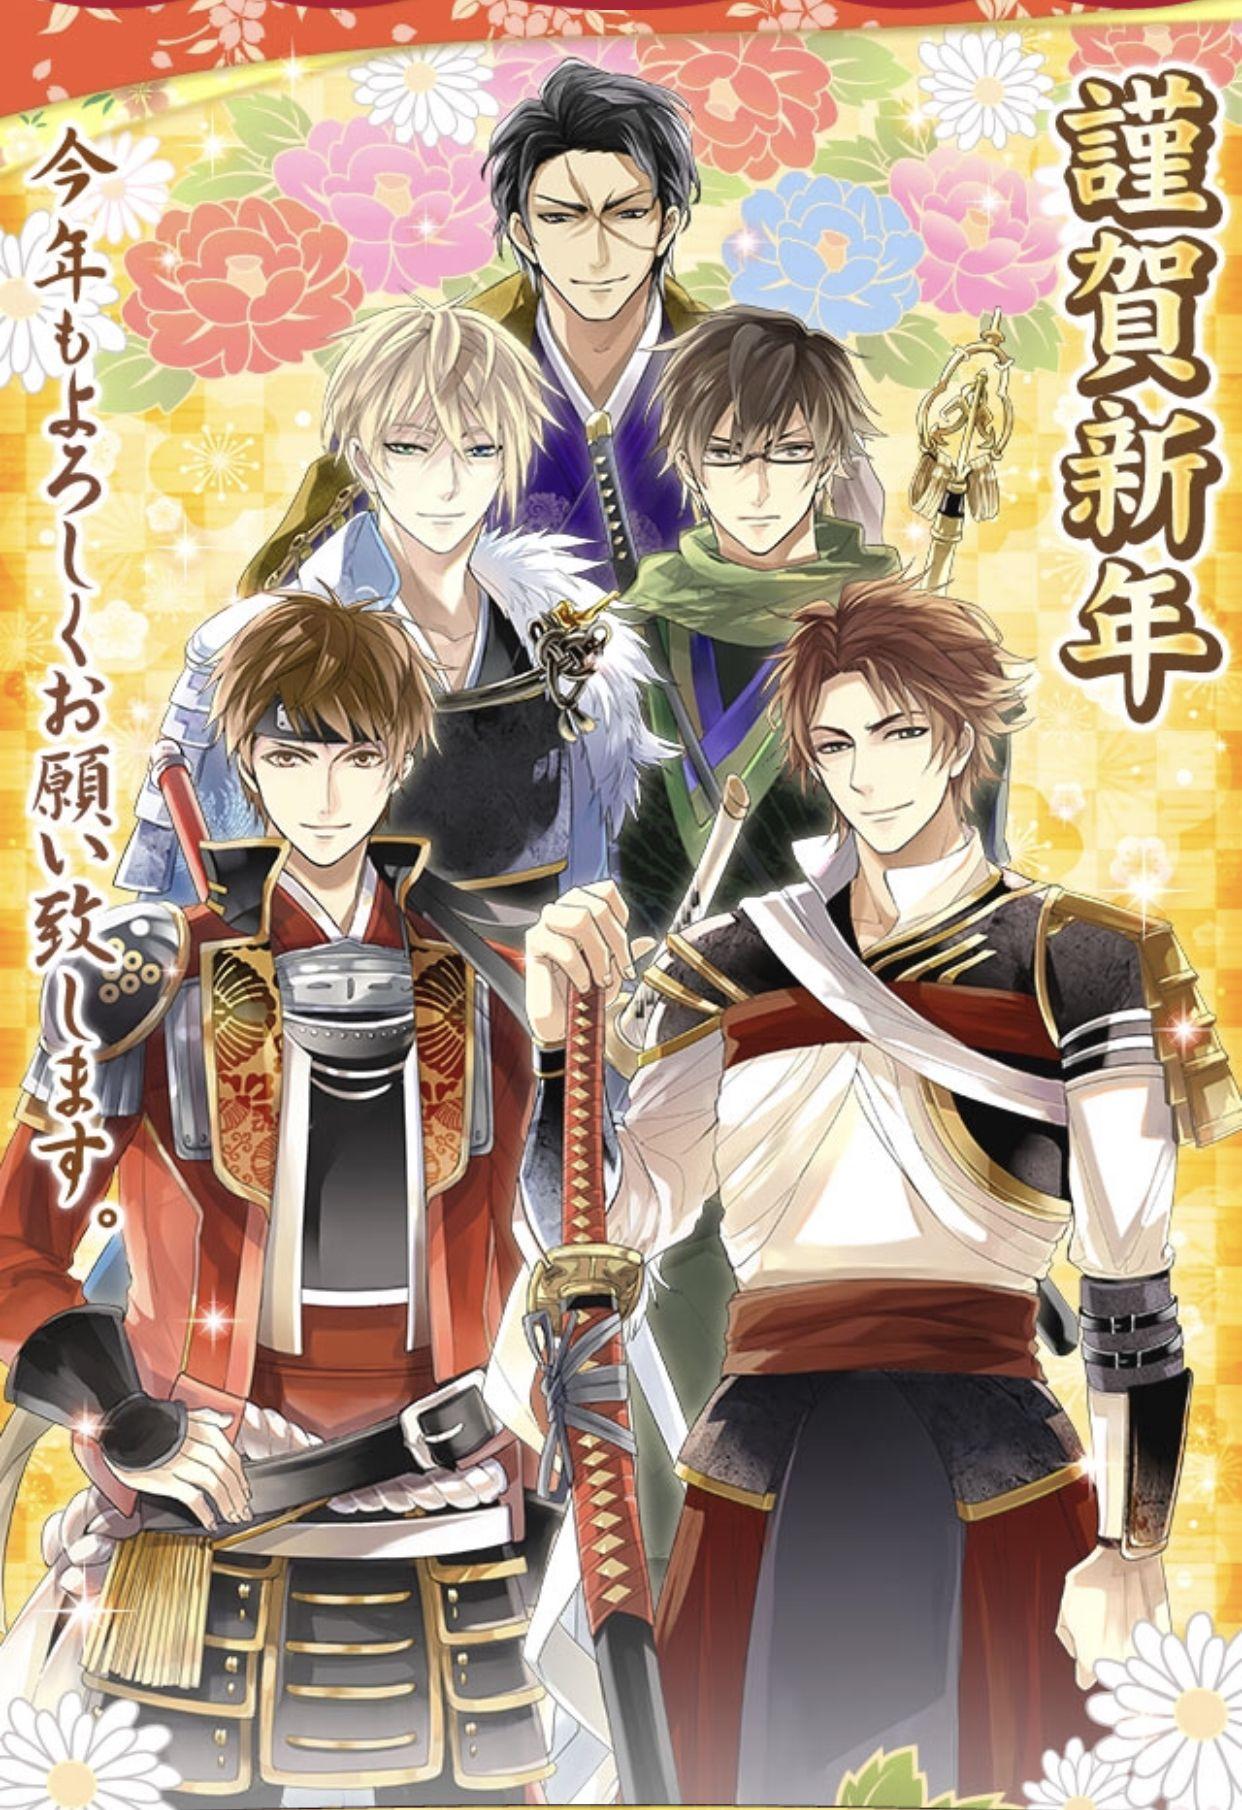 Game ikemen sengoku new year anime manga boy how to